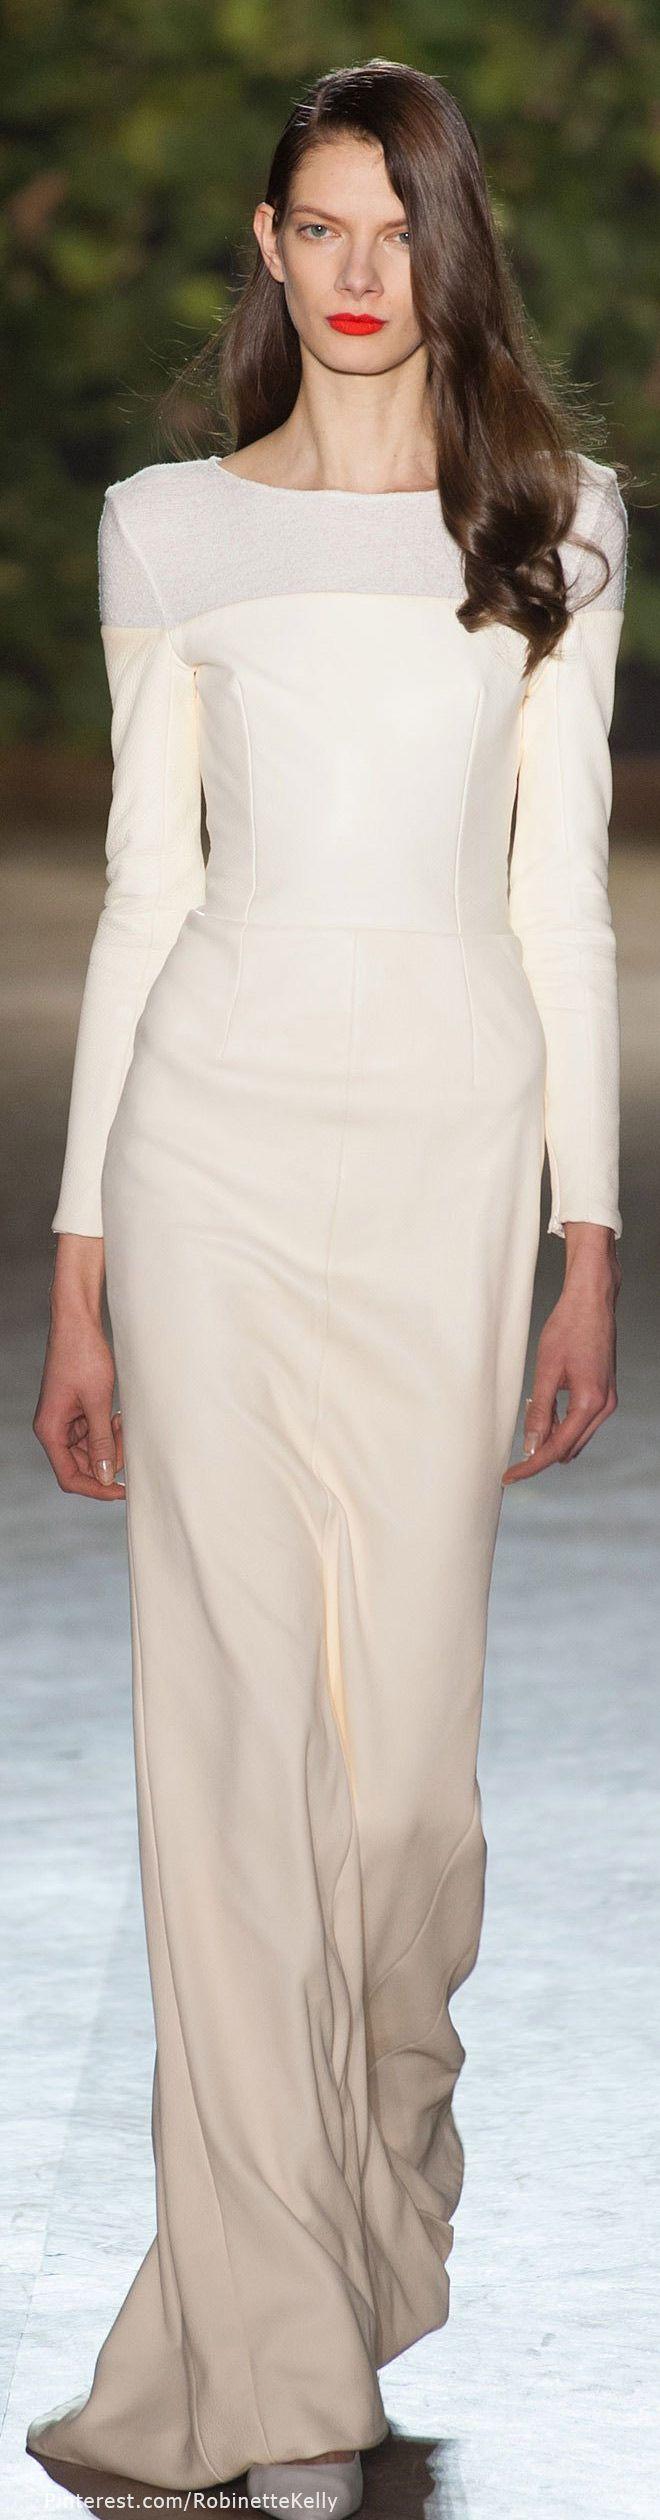 Didit Hediprasetyo Haute Couture | S/S 2014